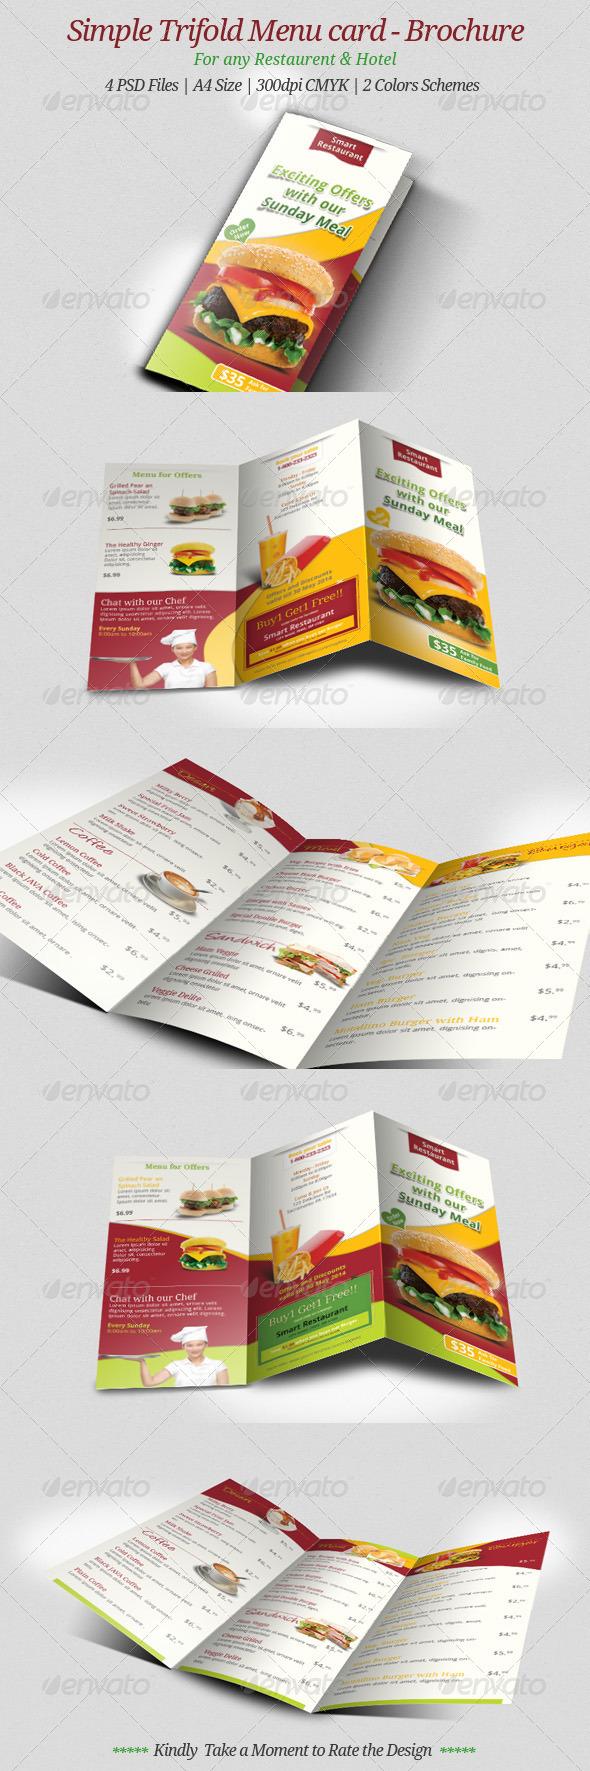 Simple Trifold Menu Card - Brochure  - Food Menus Print Templates